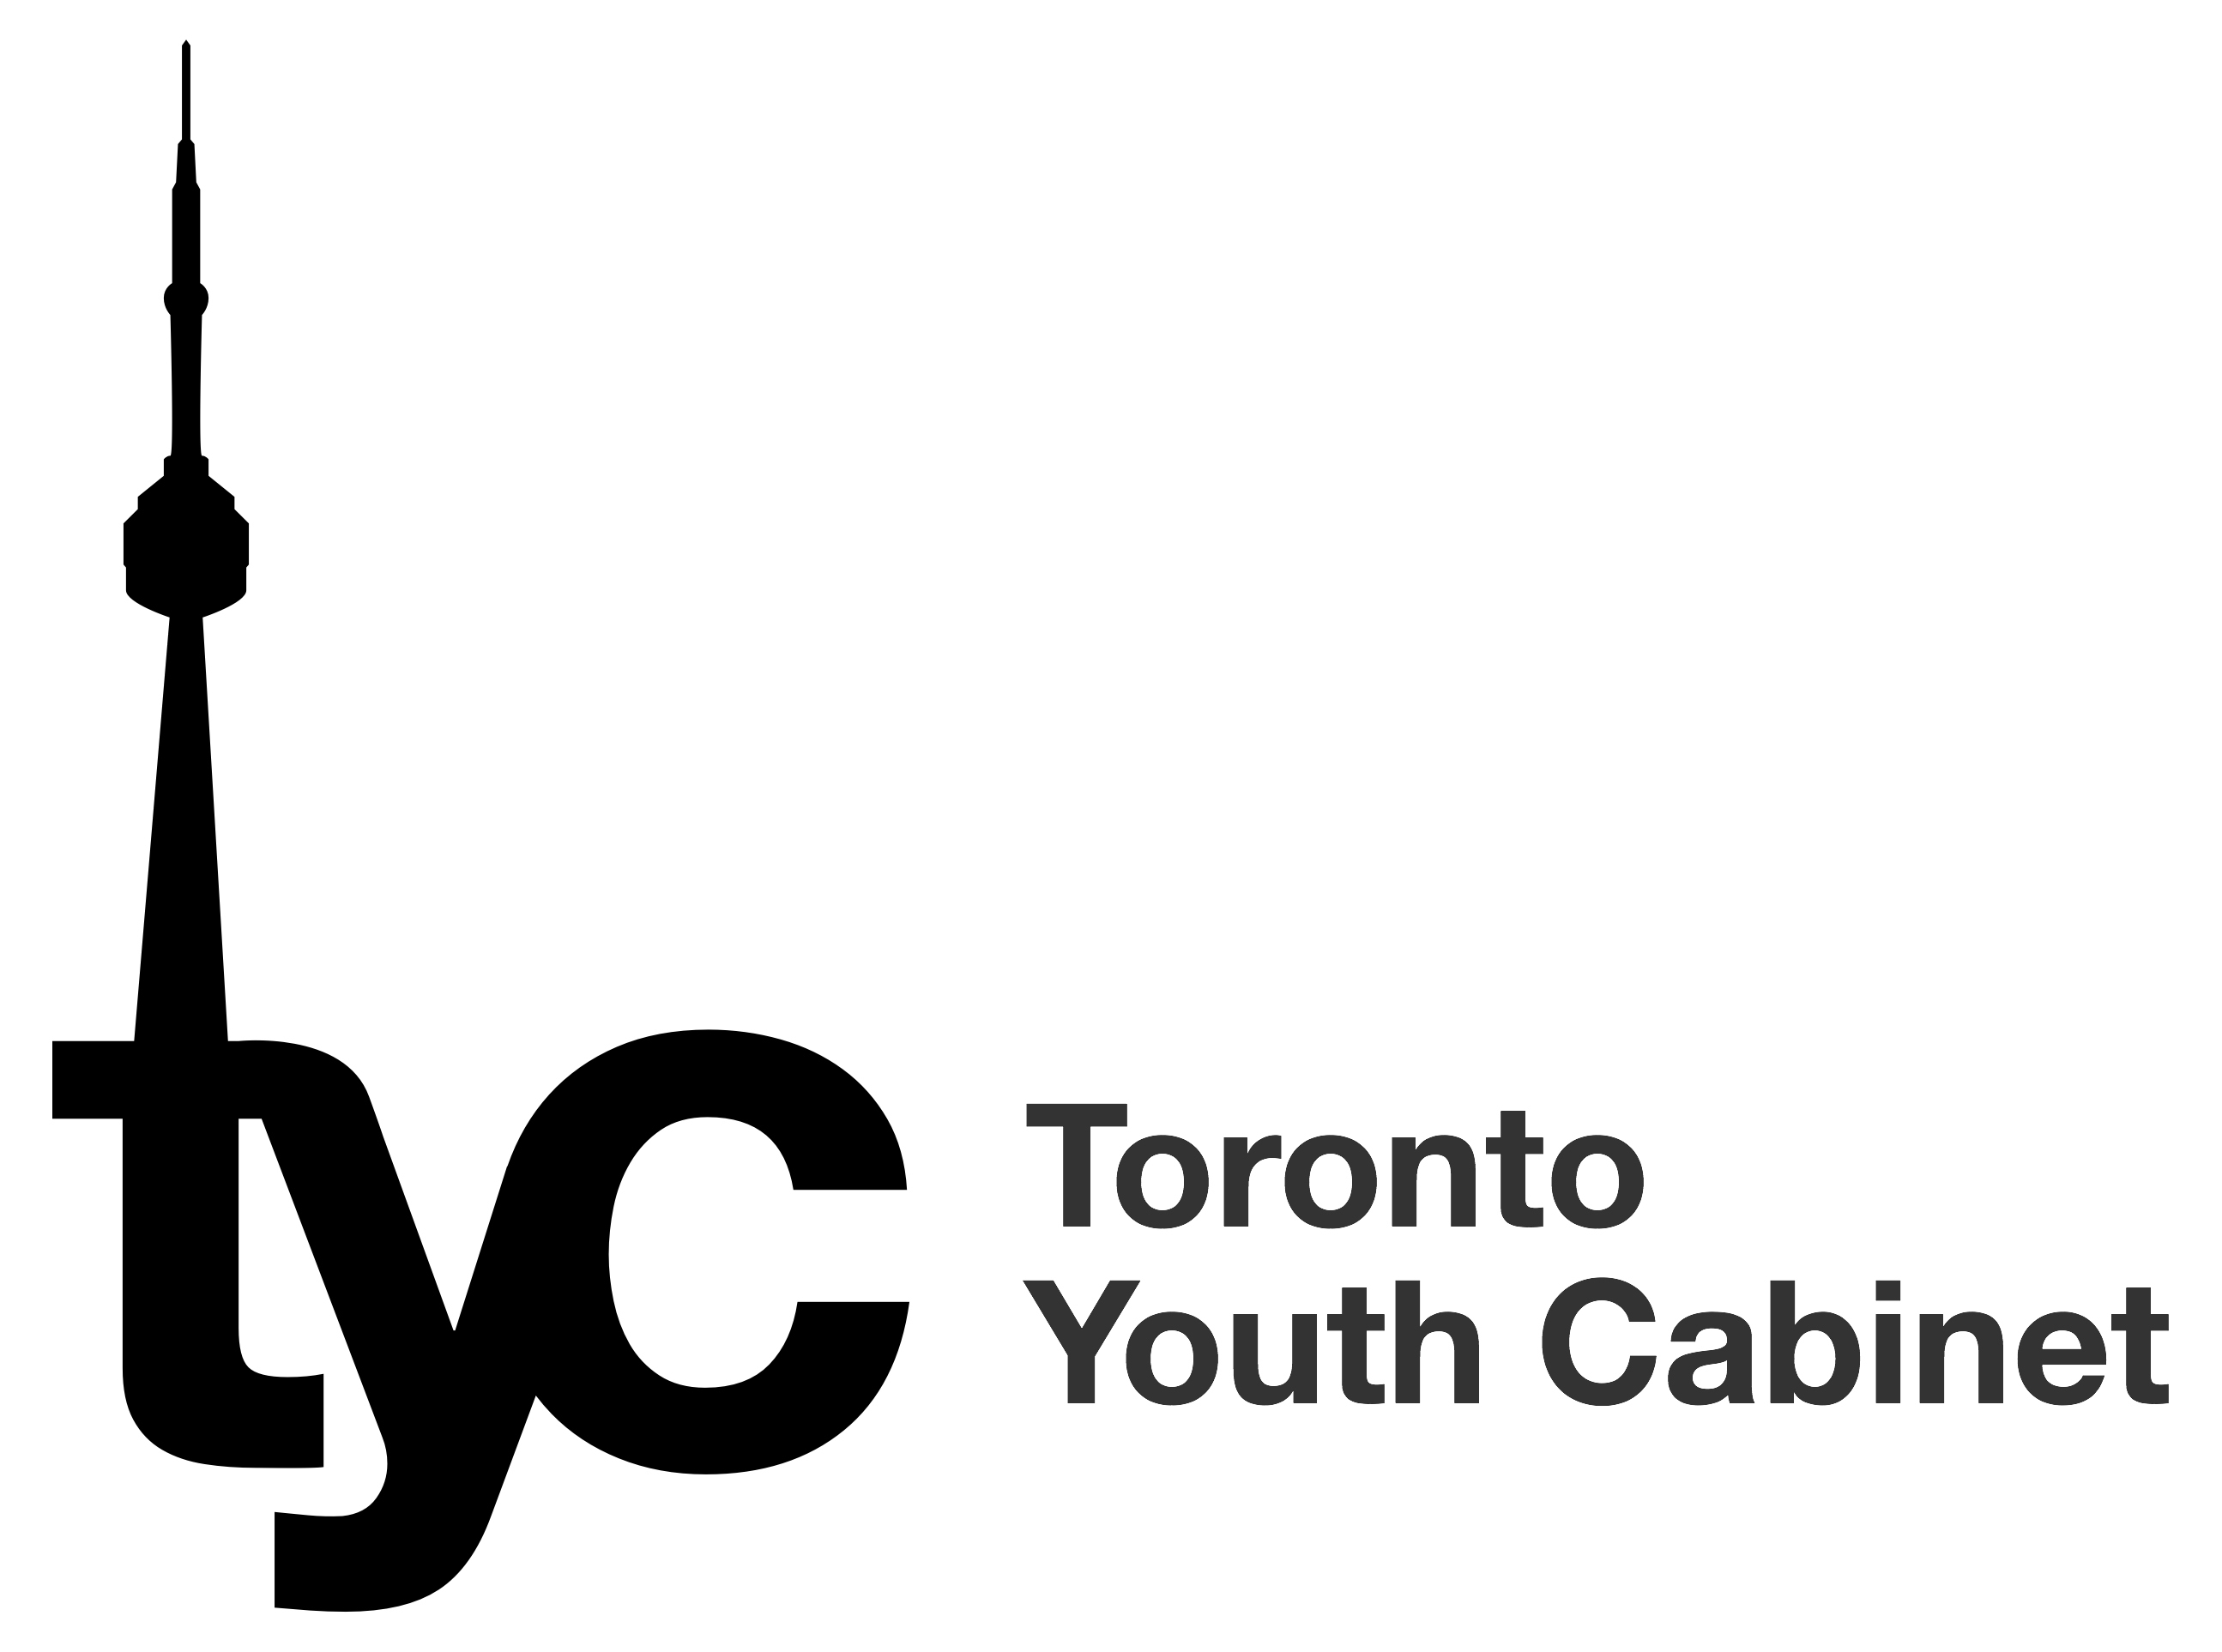 Toronto Youth Cabinet